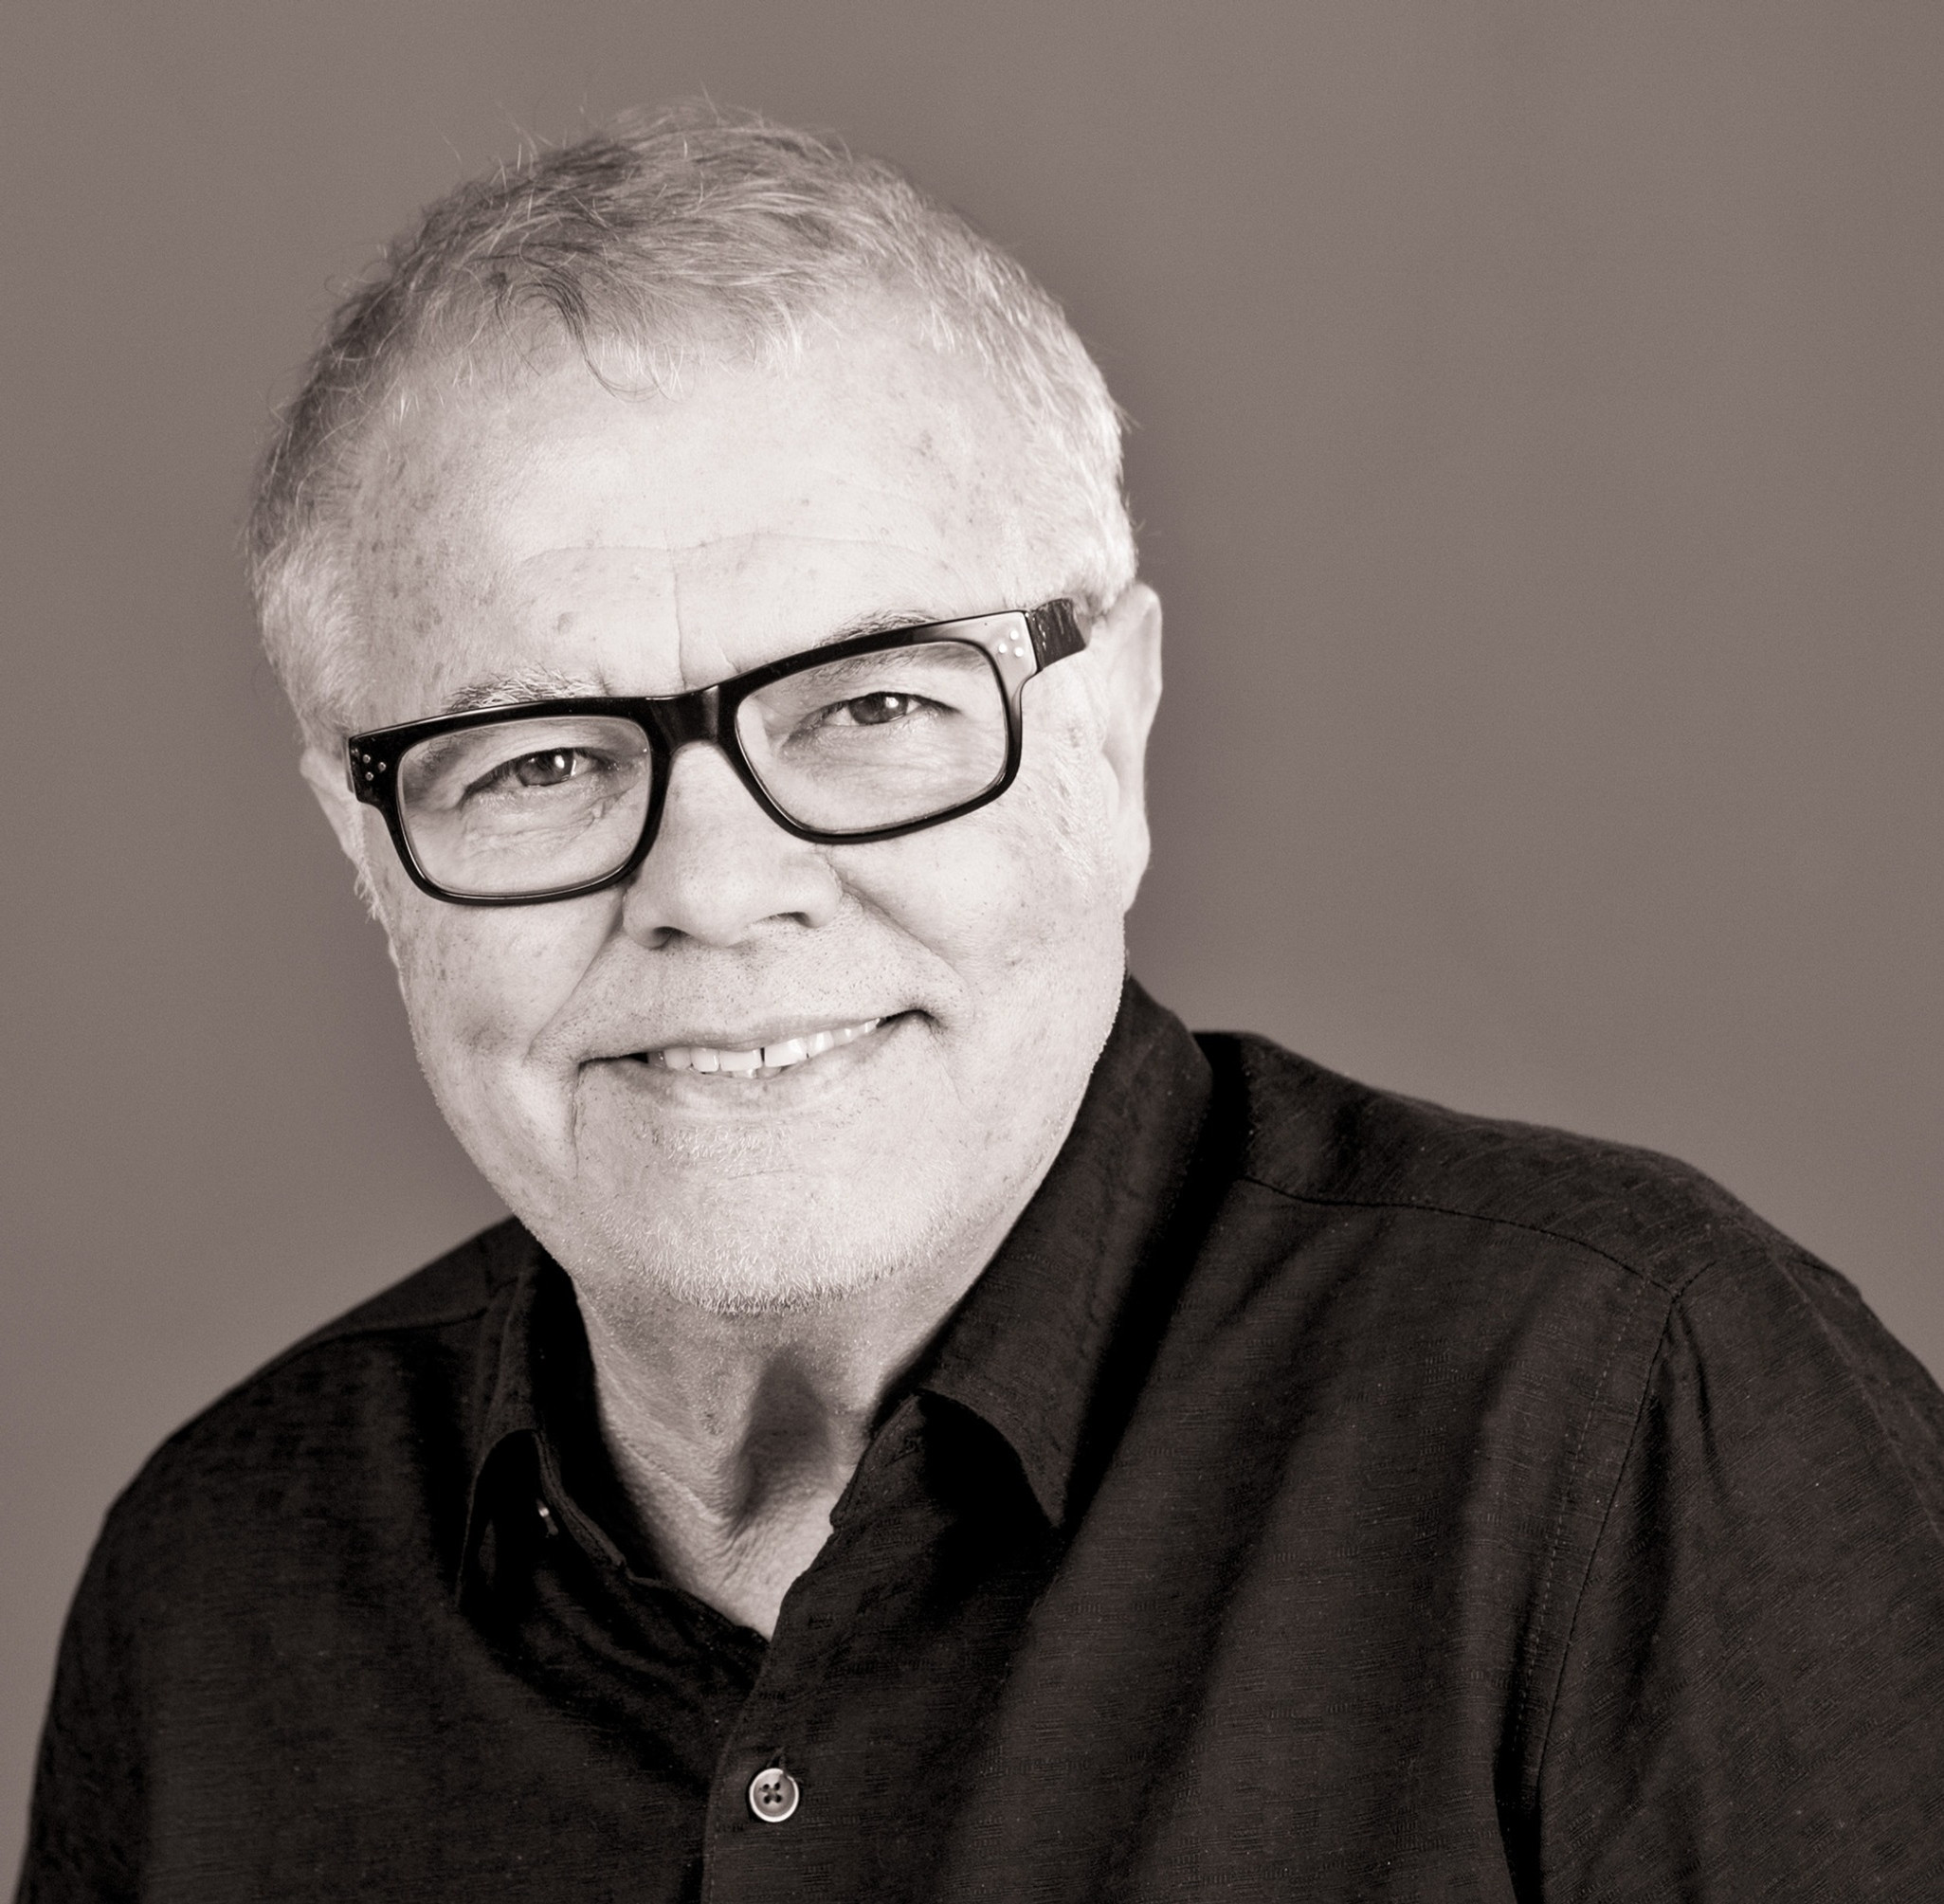 Executive and Leadership Coaching - John